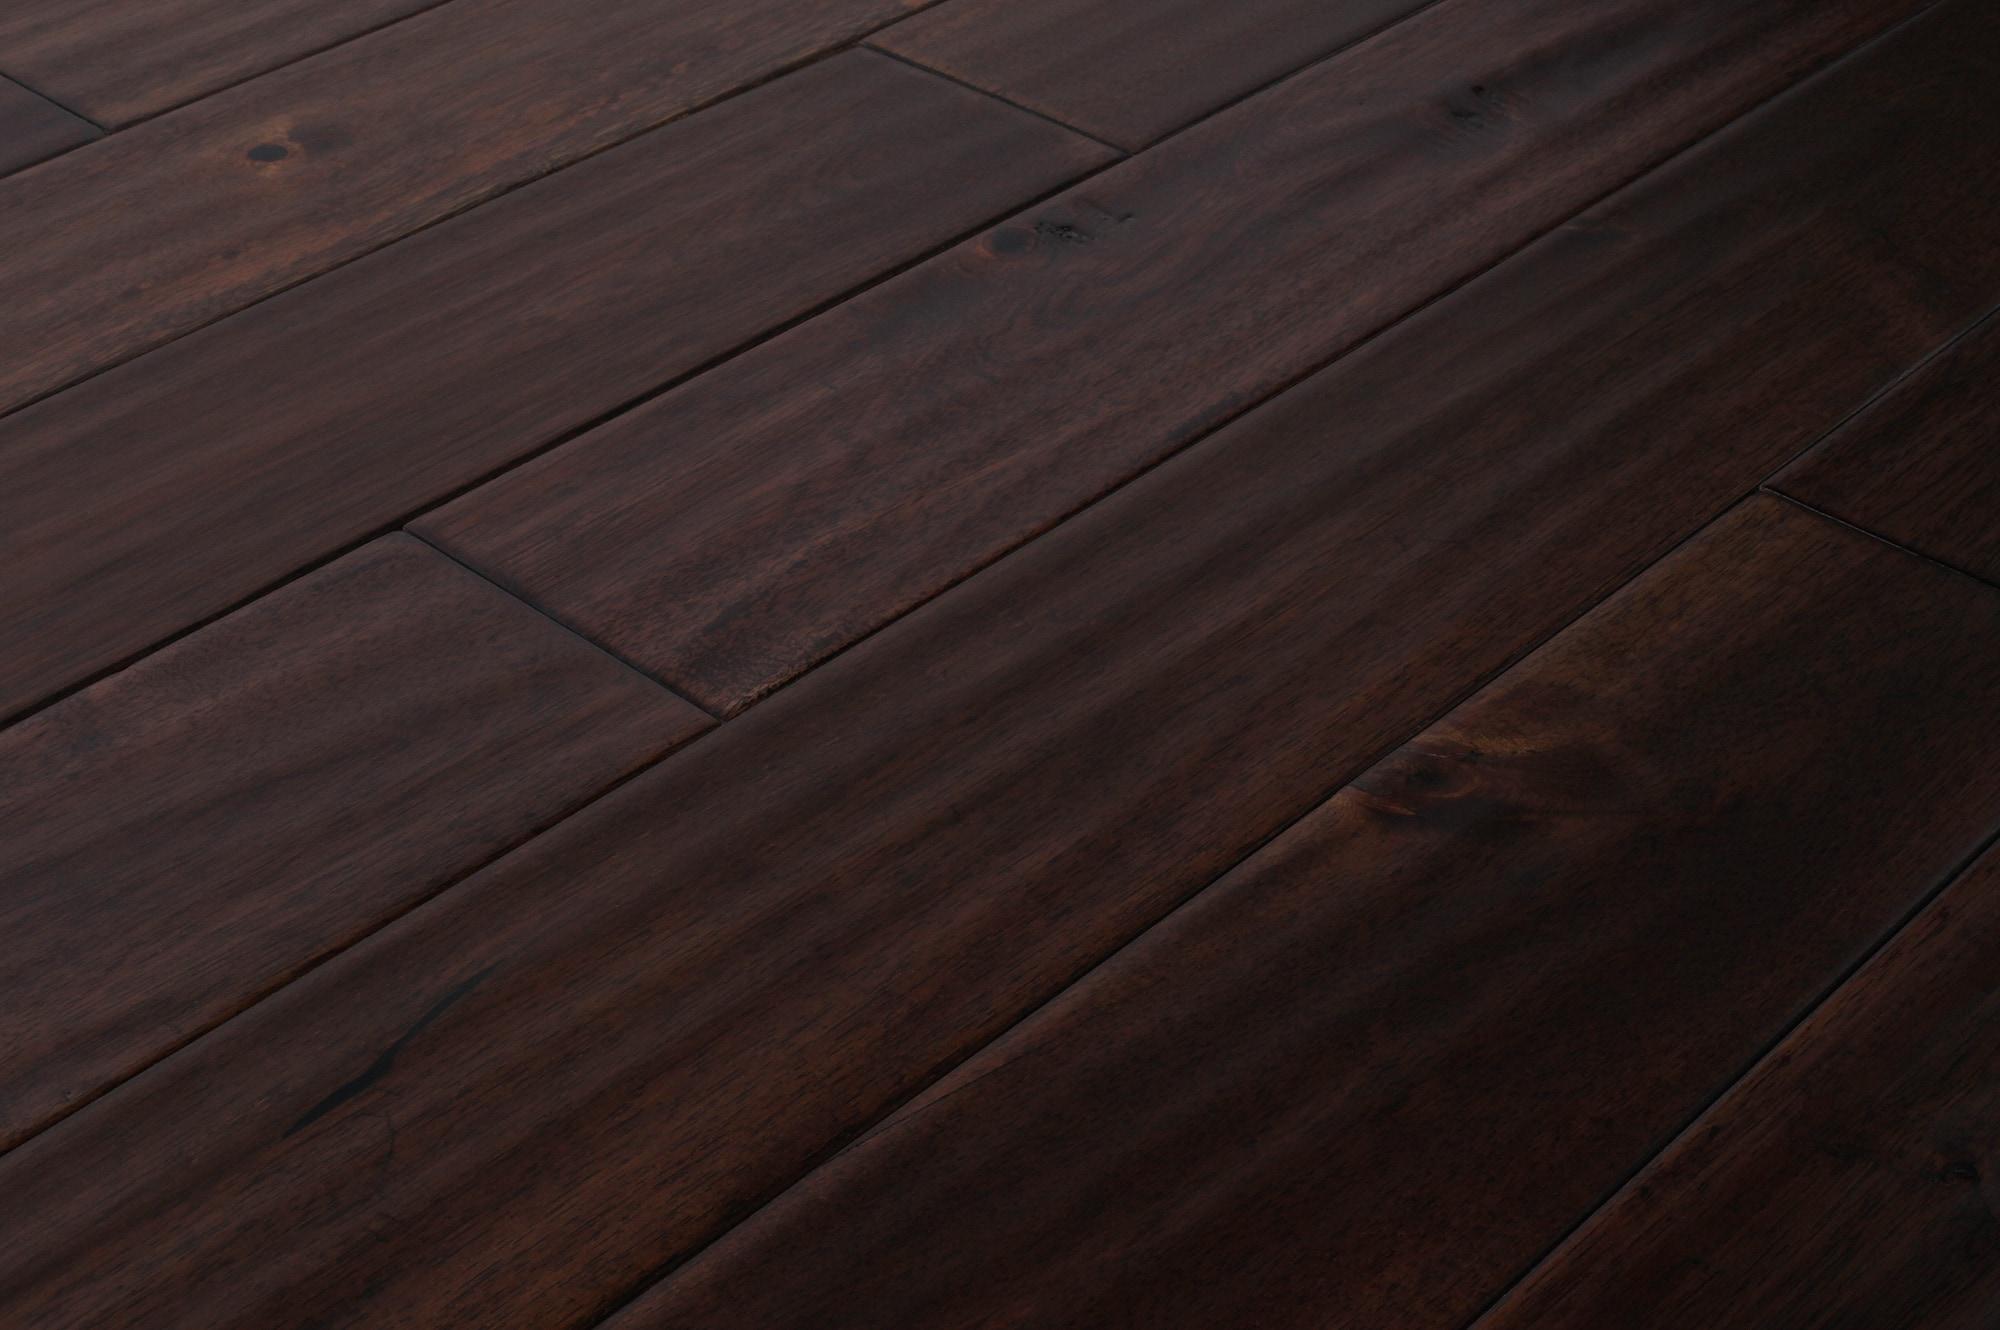 Mazama hardwood handscraped acacia collection oolong for Acacia hardwood flooring